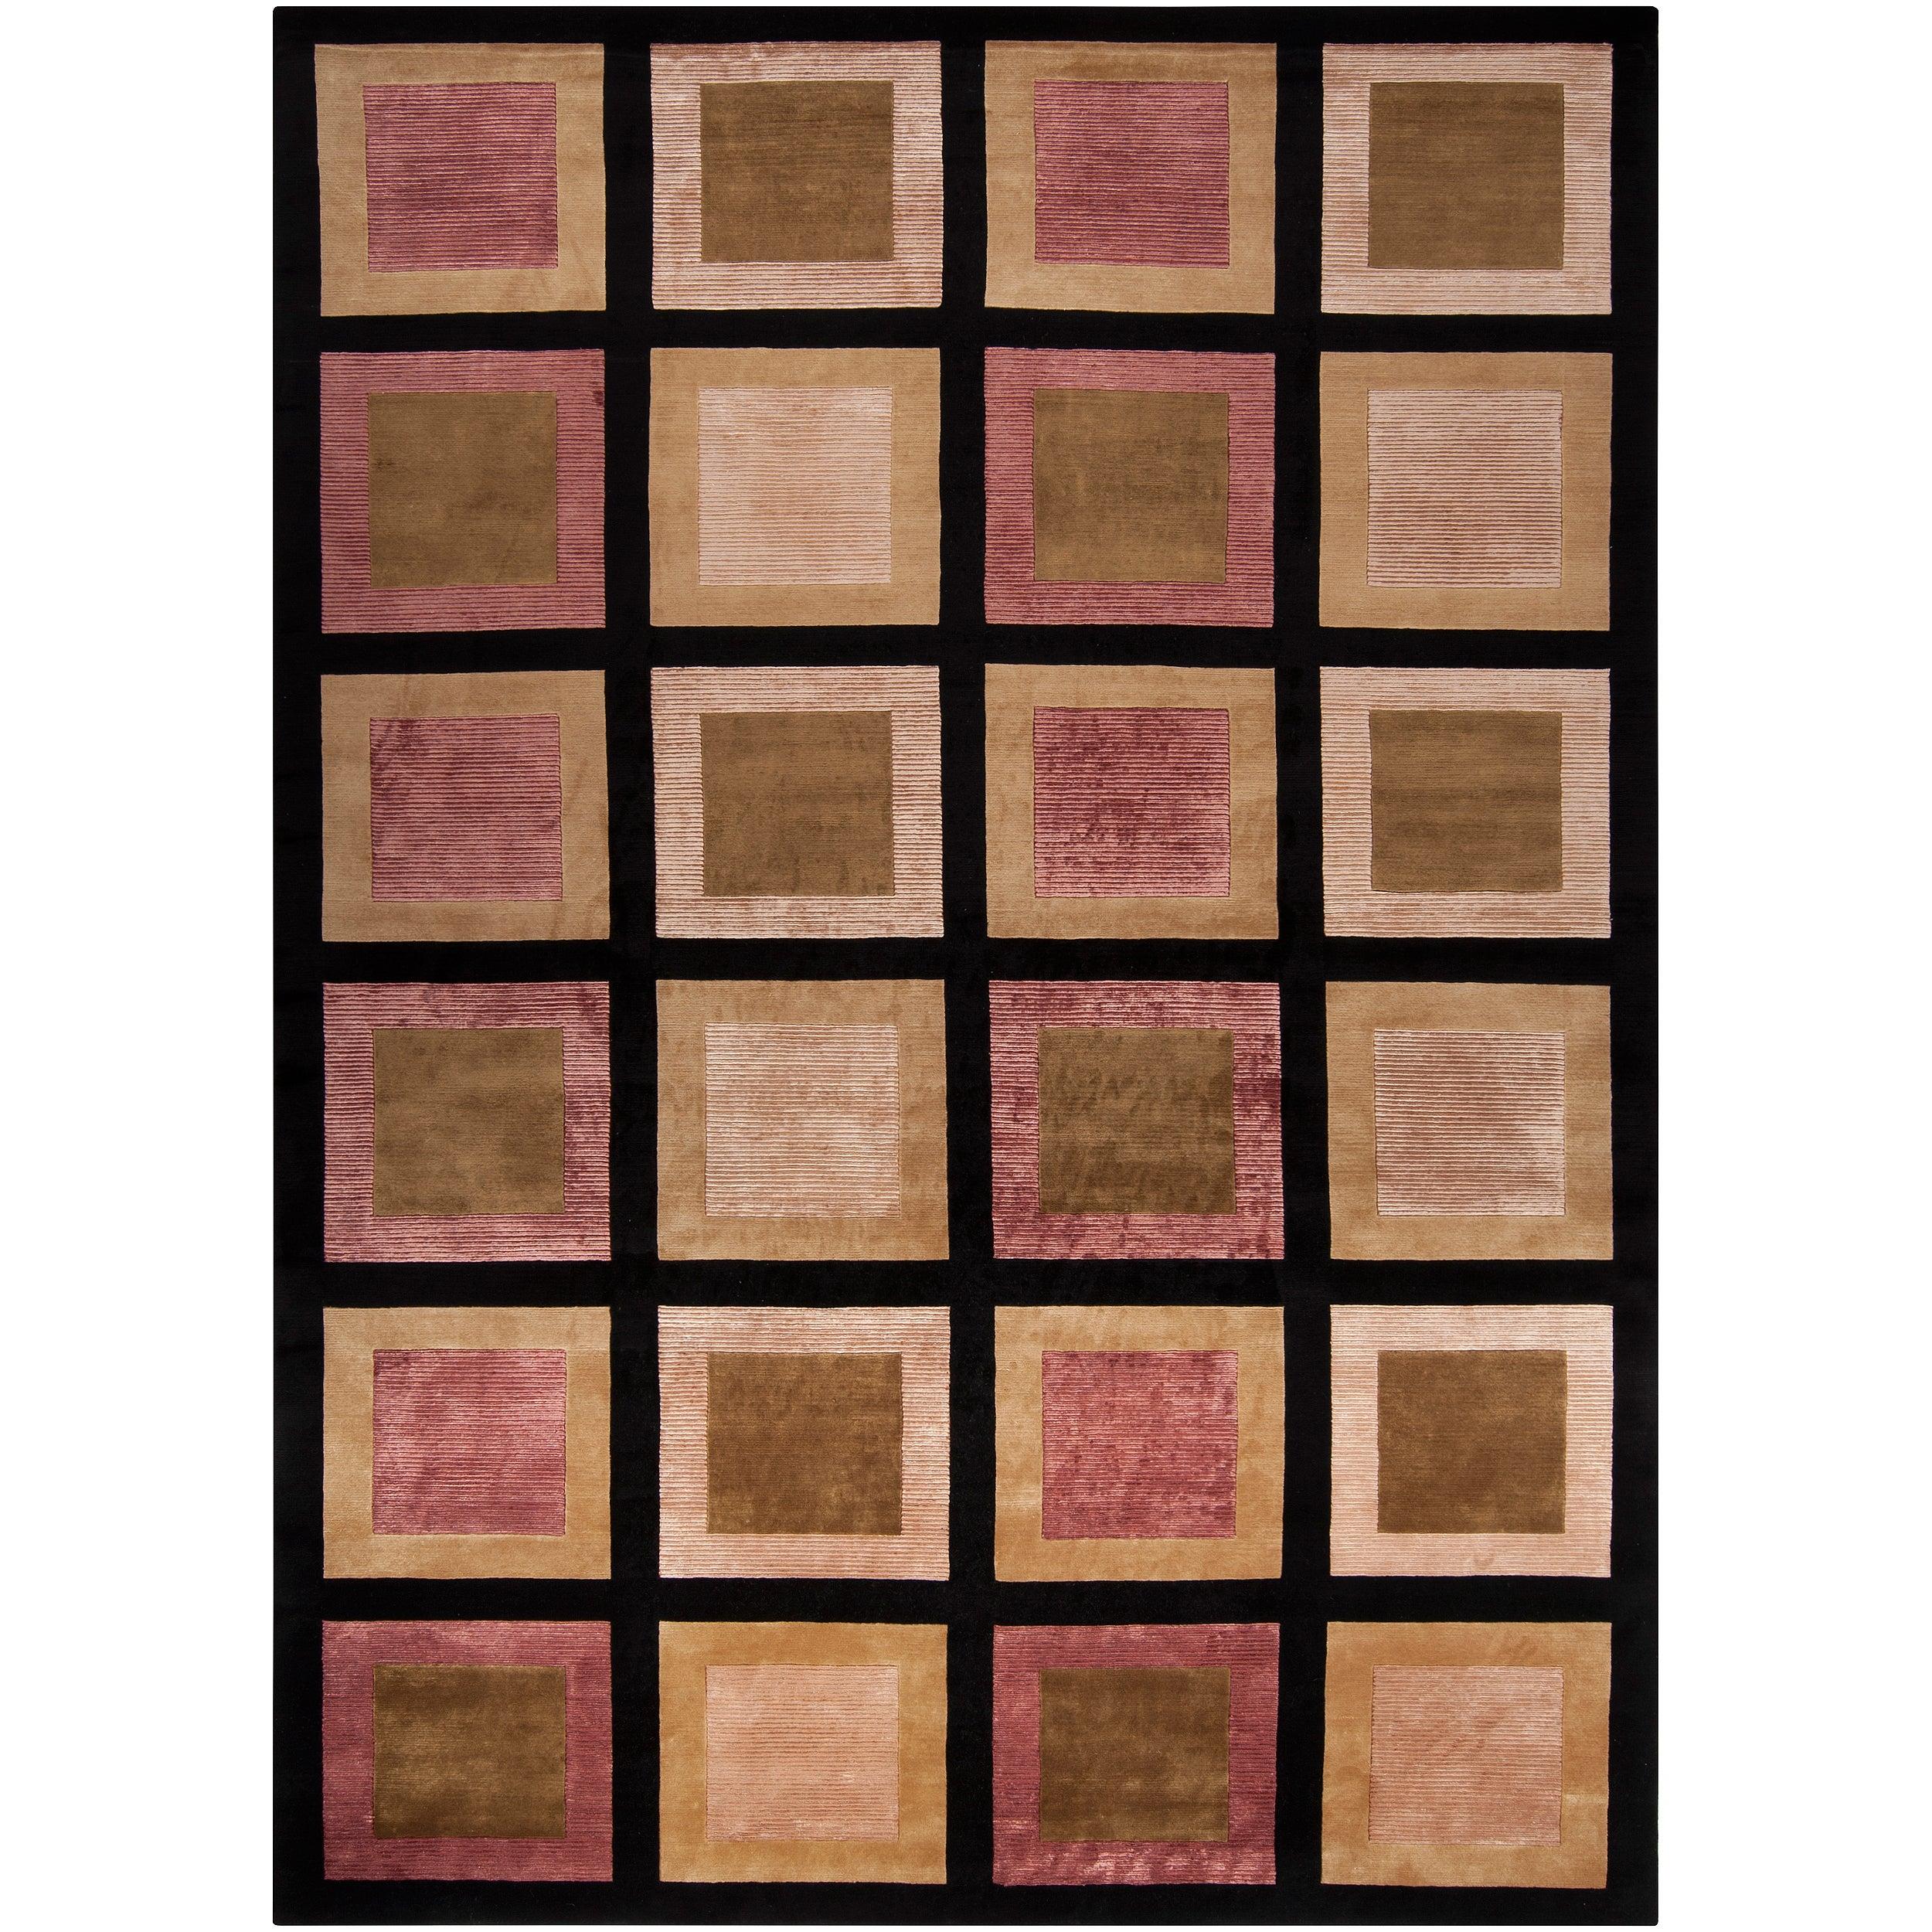 Hand-knotted Multicolored La Crosse Geometric Semi-Worsted Geometric Squares Wool Area Rug - 9' x 13'